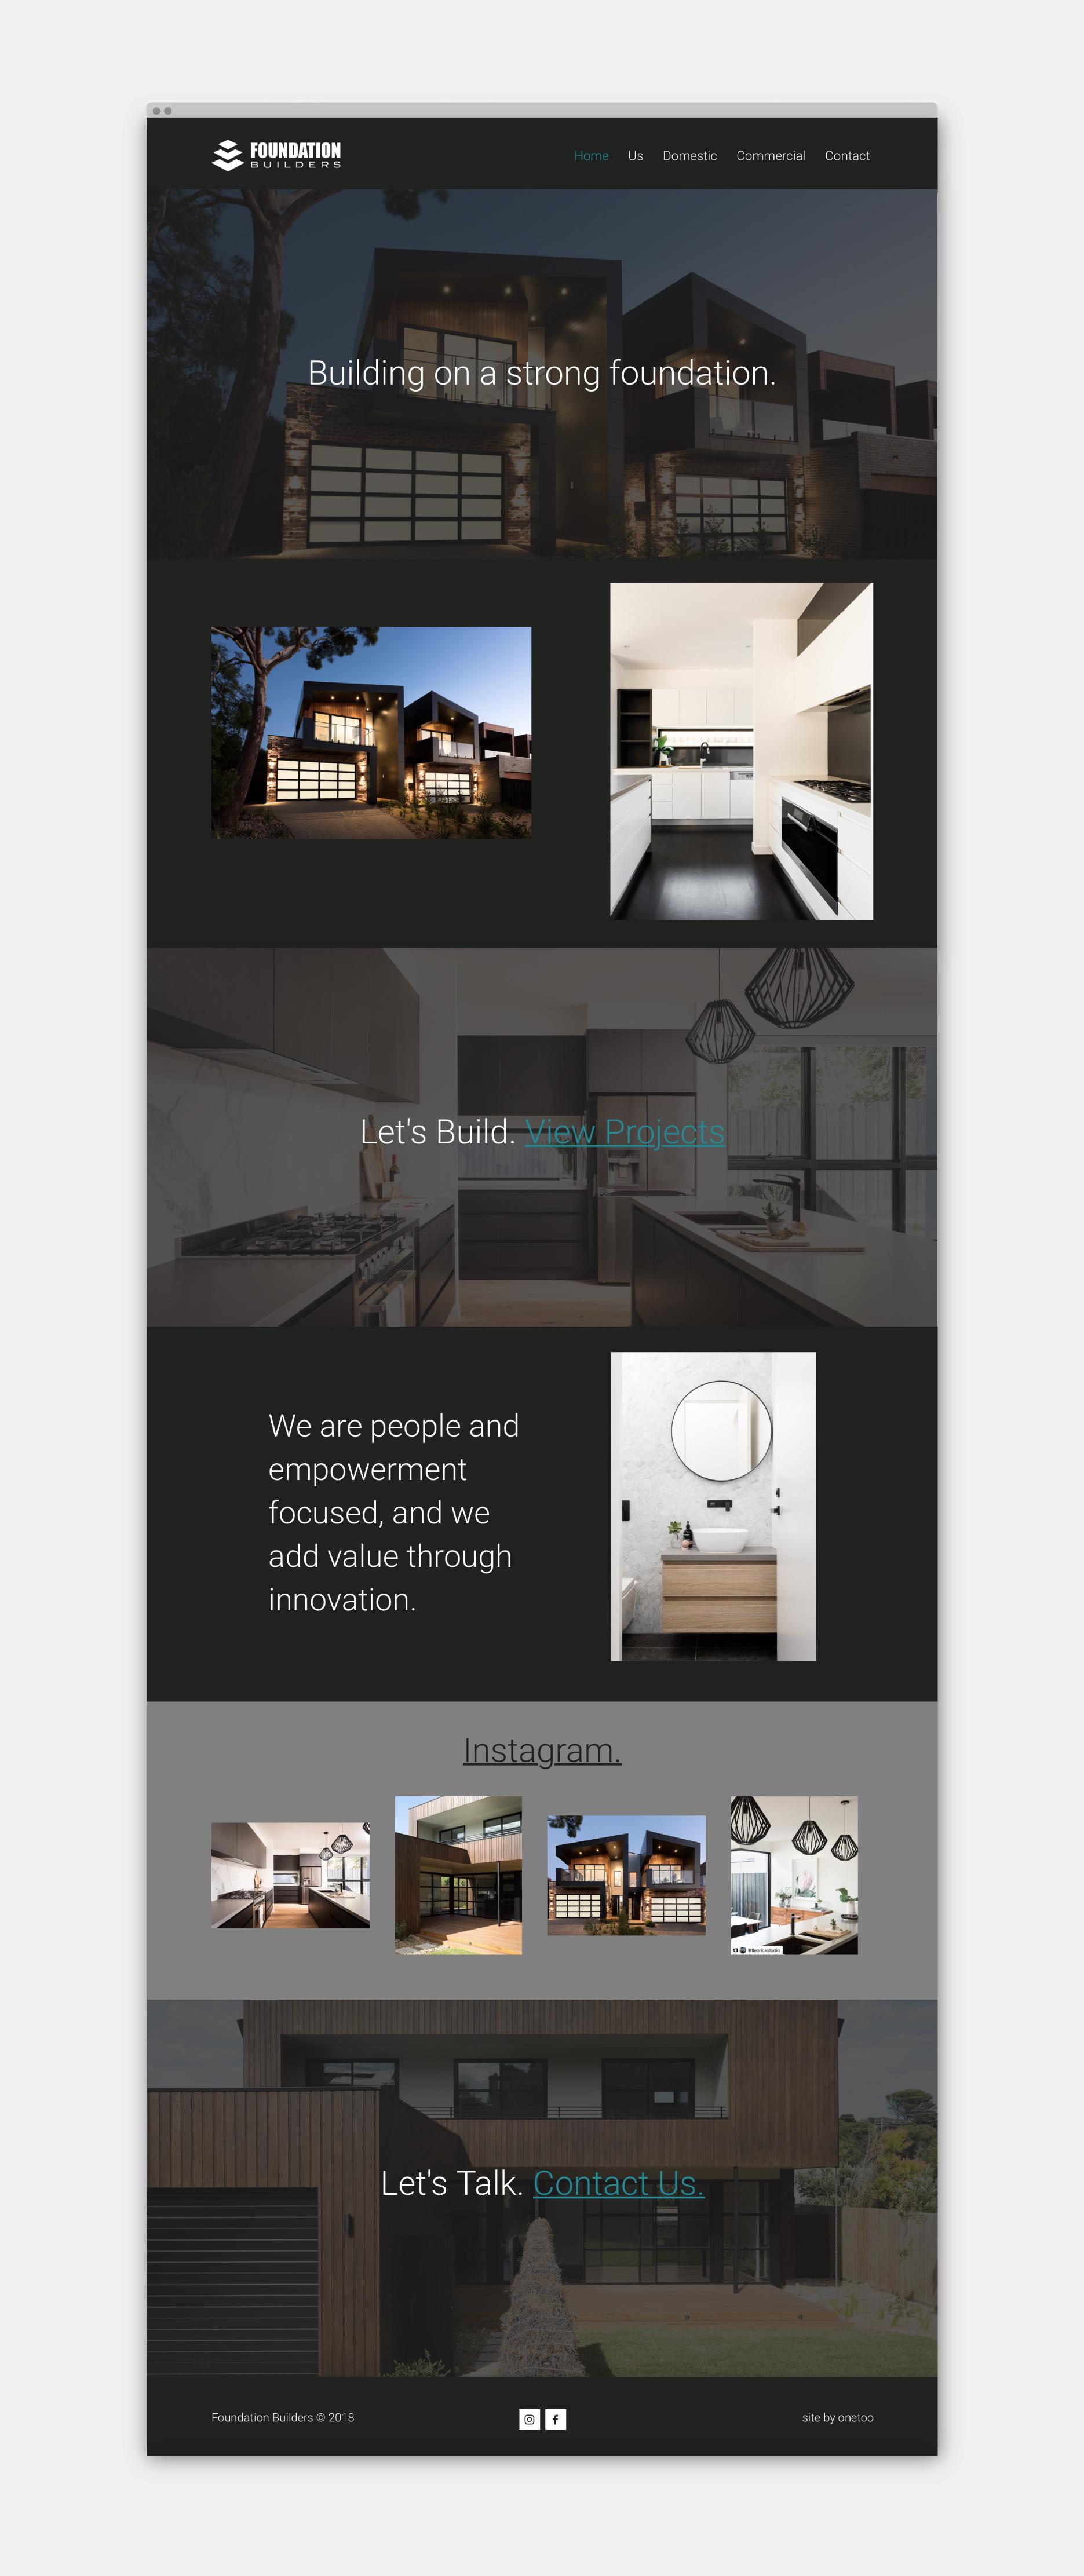 Foundation-Builders-Site.jpg